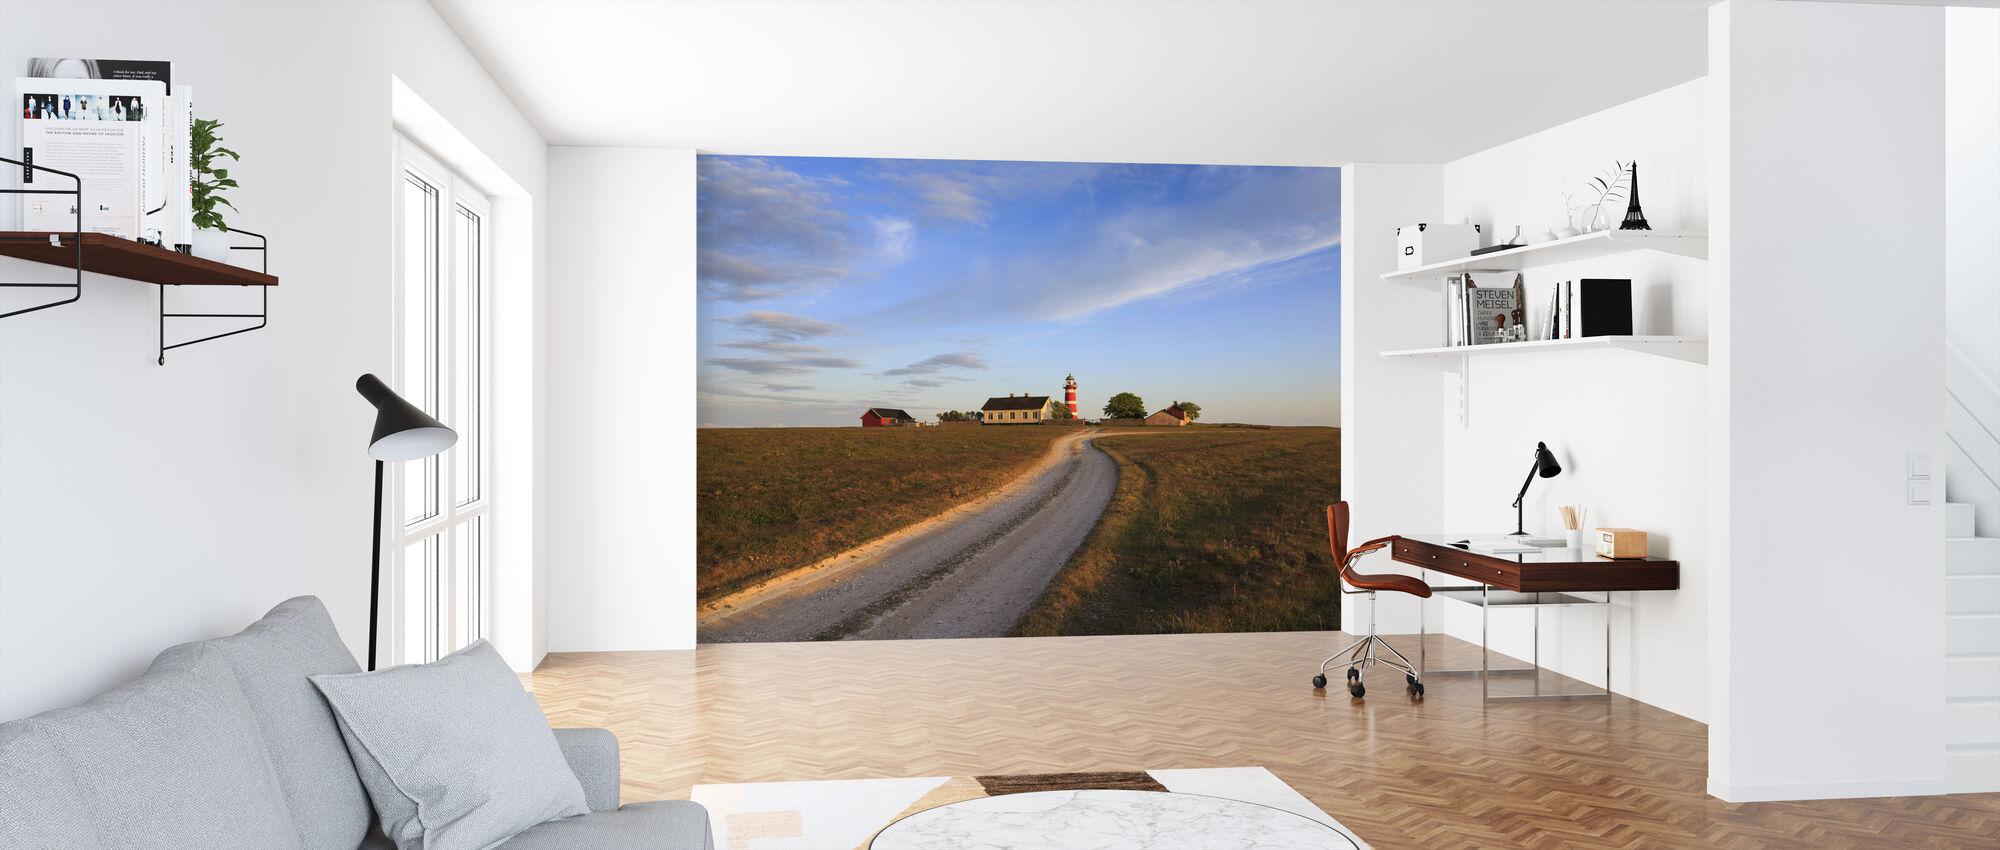 Landstraße zum Leuchtturm, Gotland - Tapete - Büro